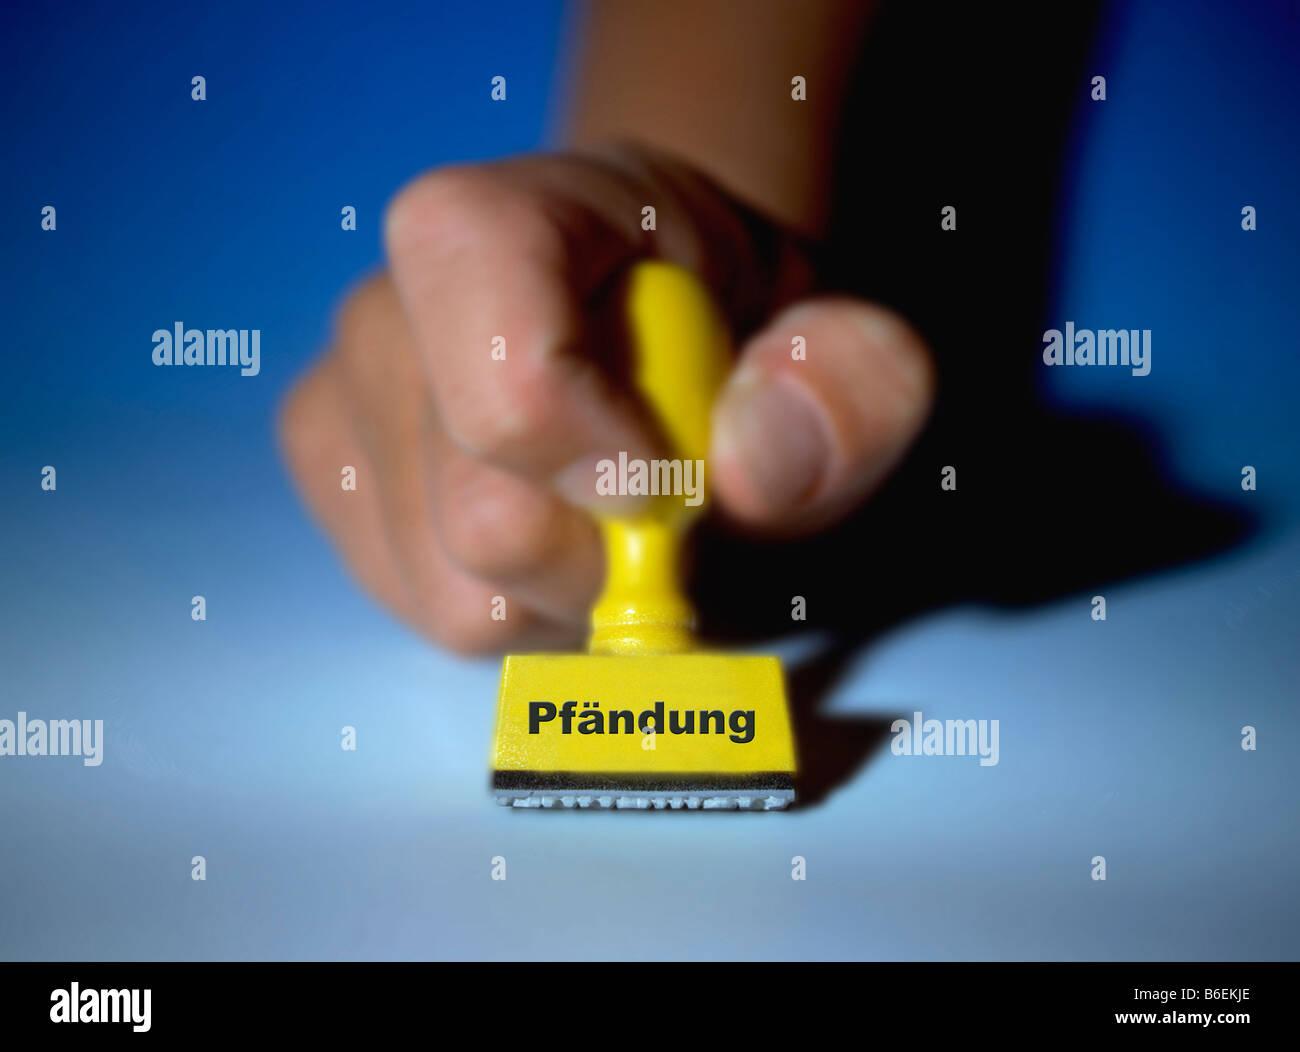 digital enhancement rubber stamp marked in german pfandung - Stock Image